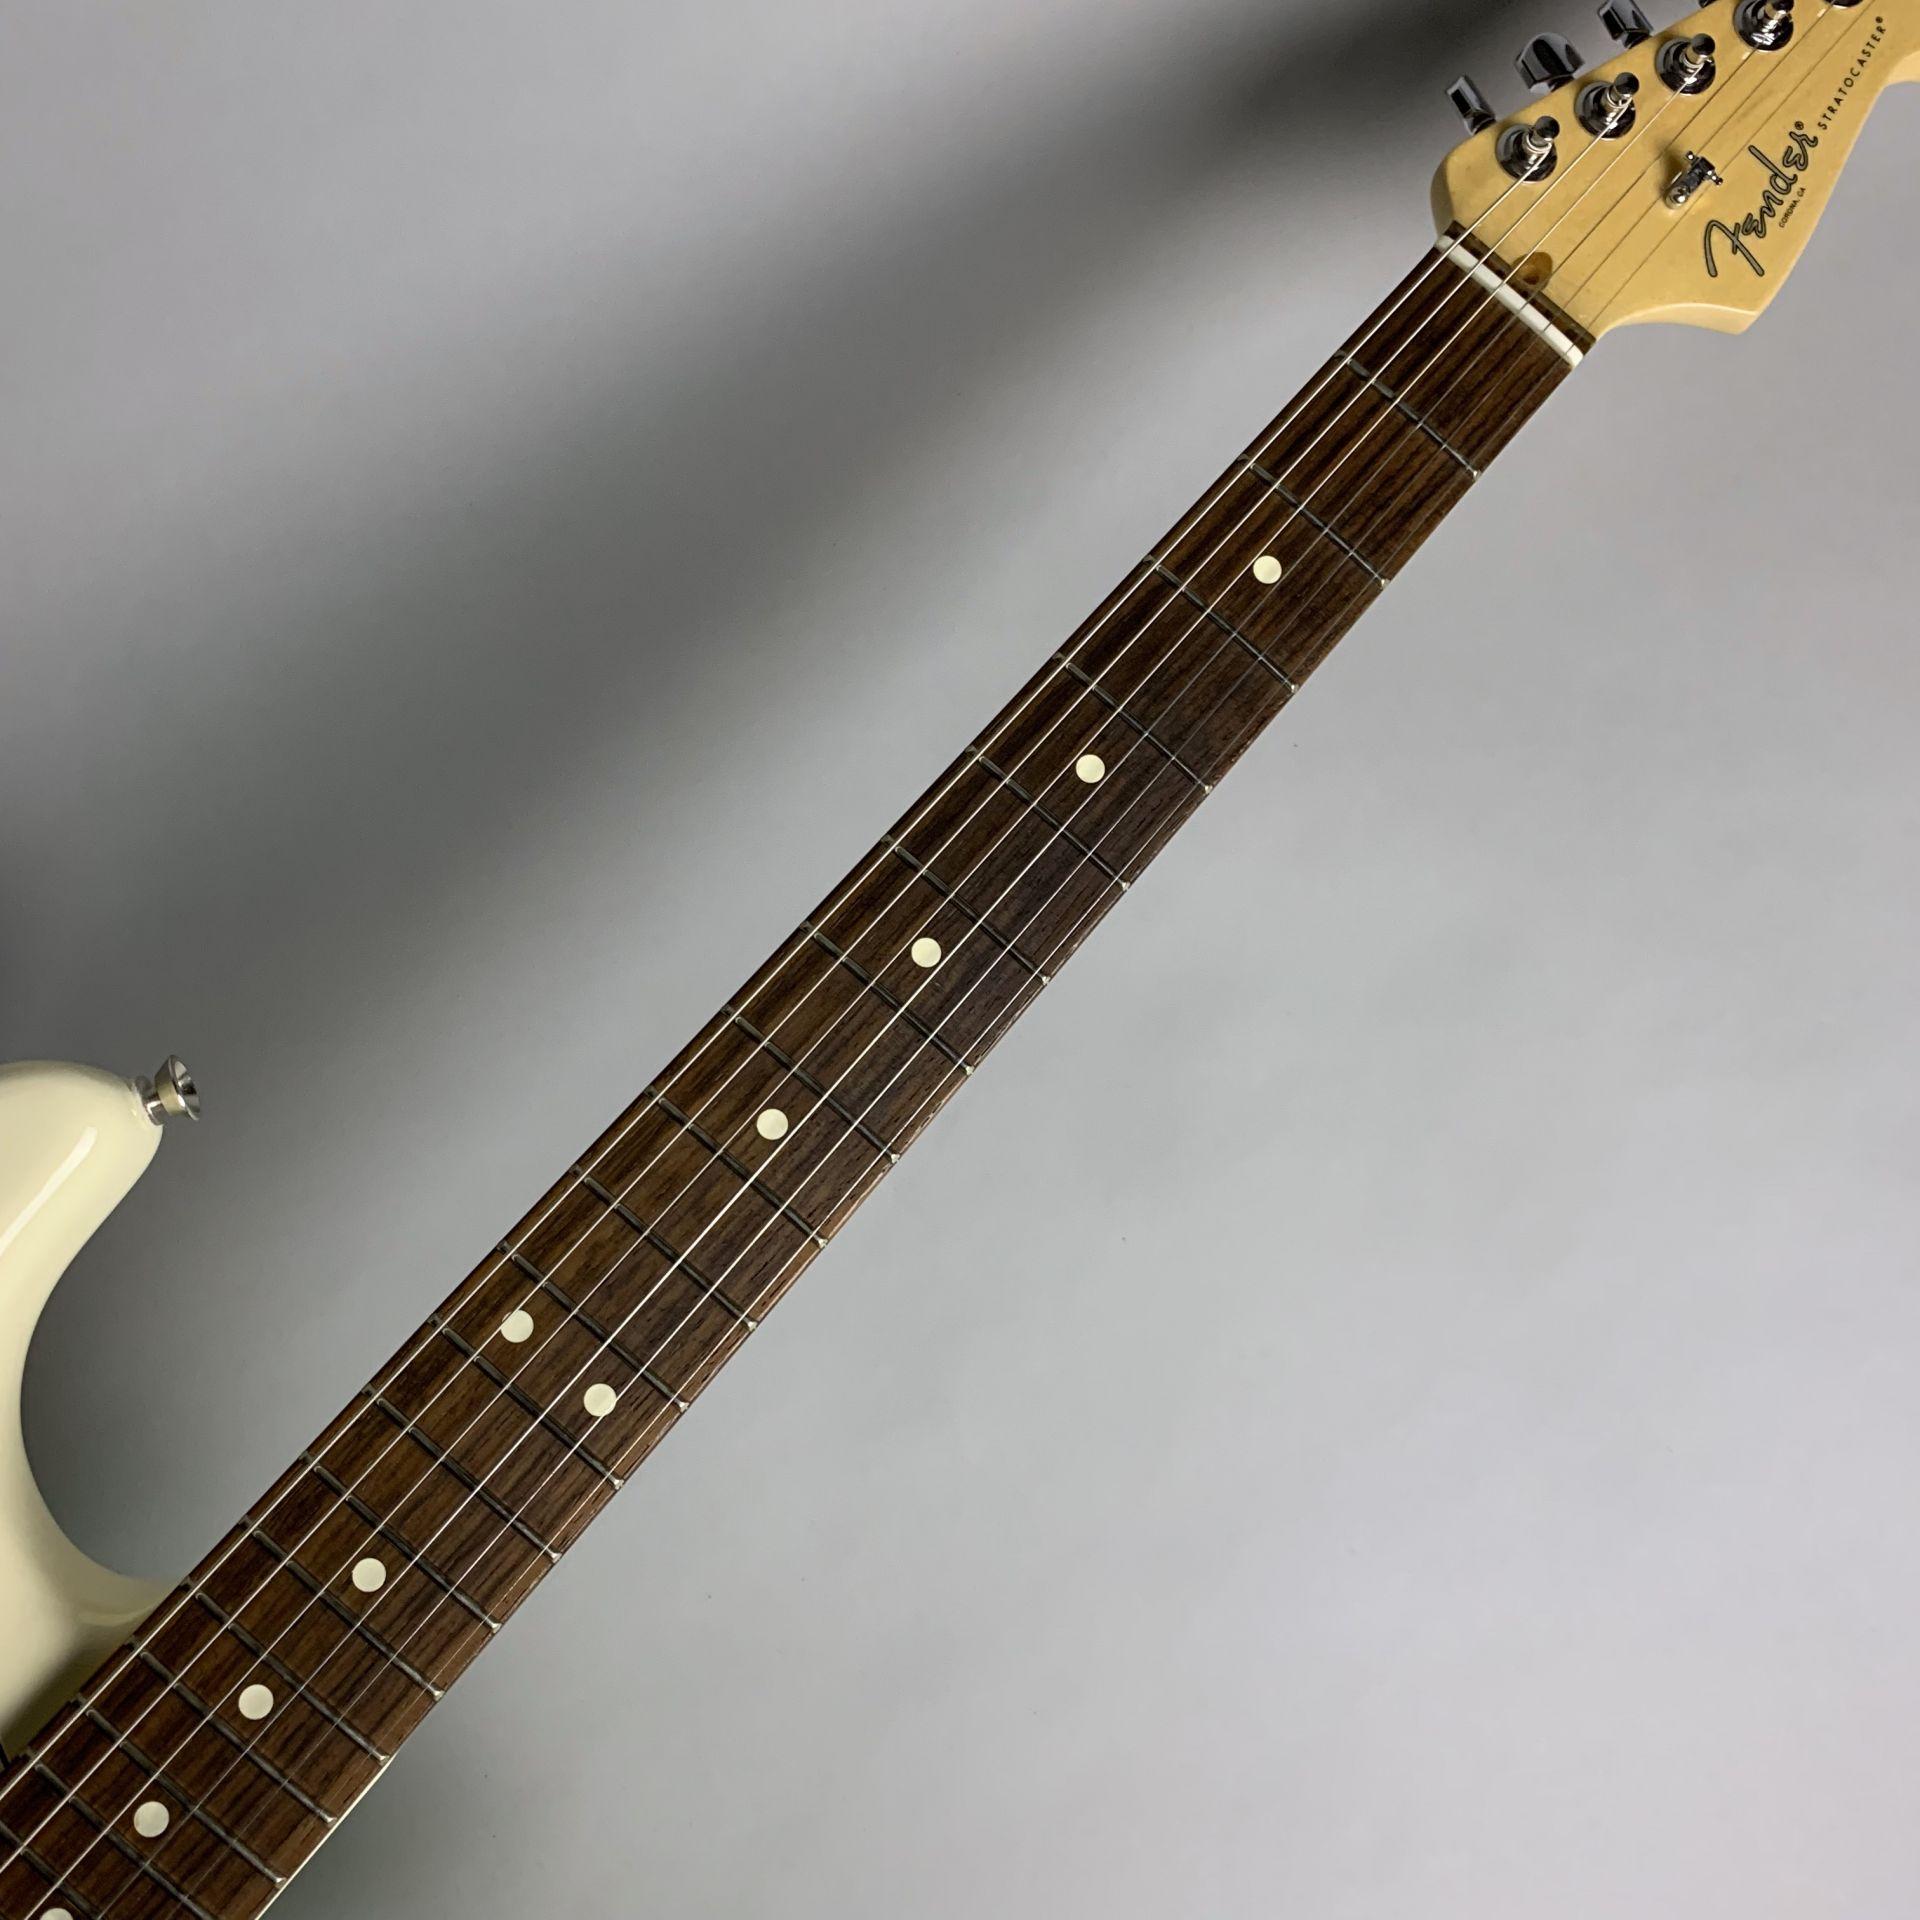 American Professional Stratocasterのボディバック-アップ画像